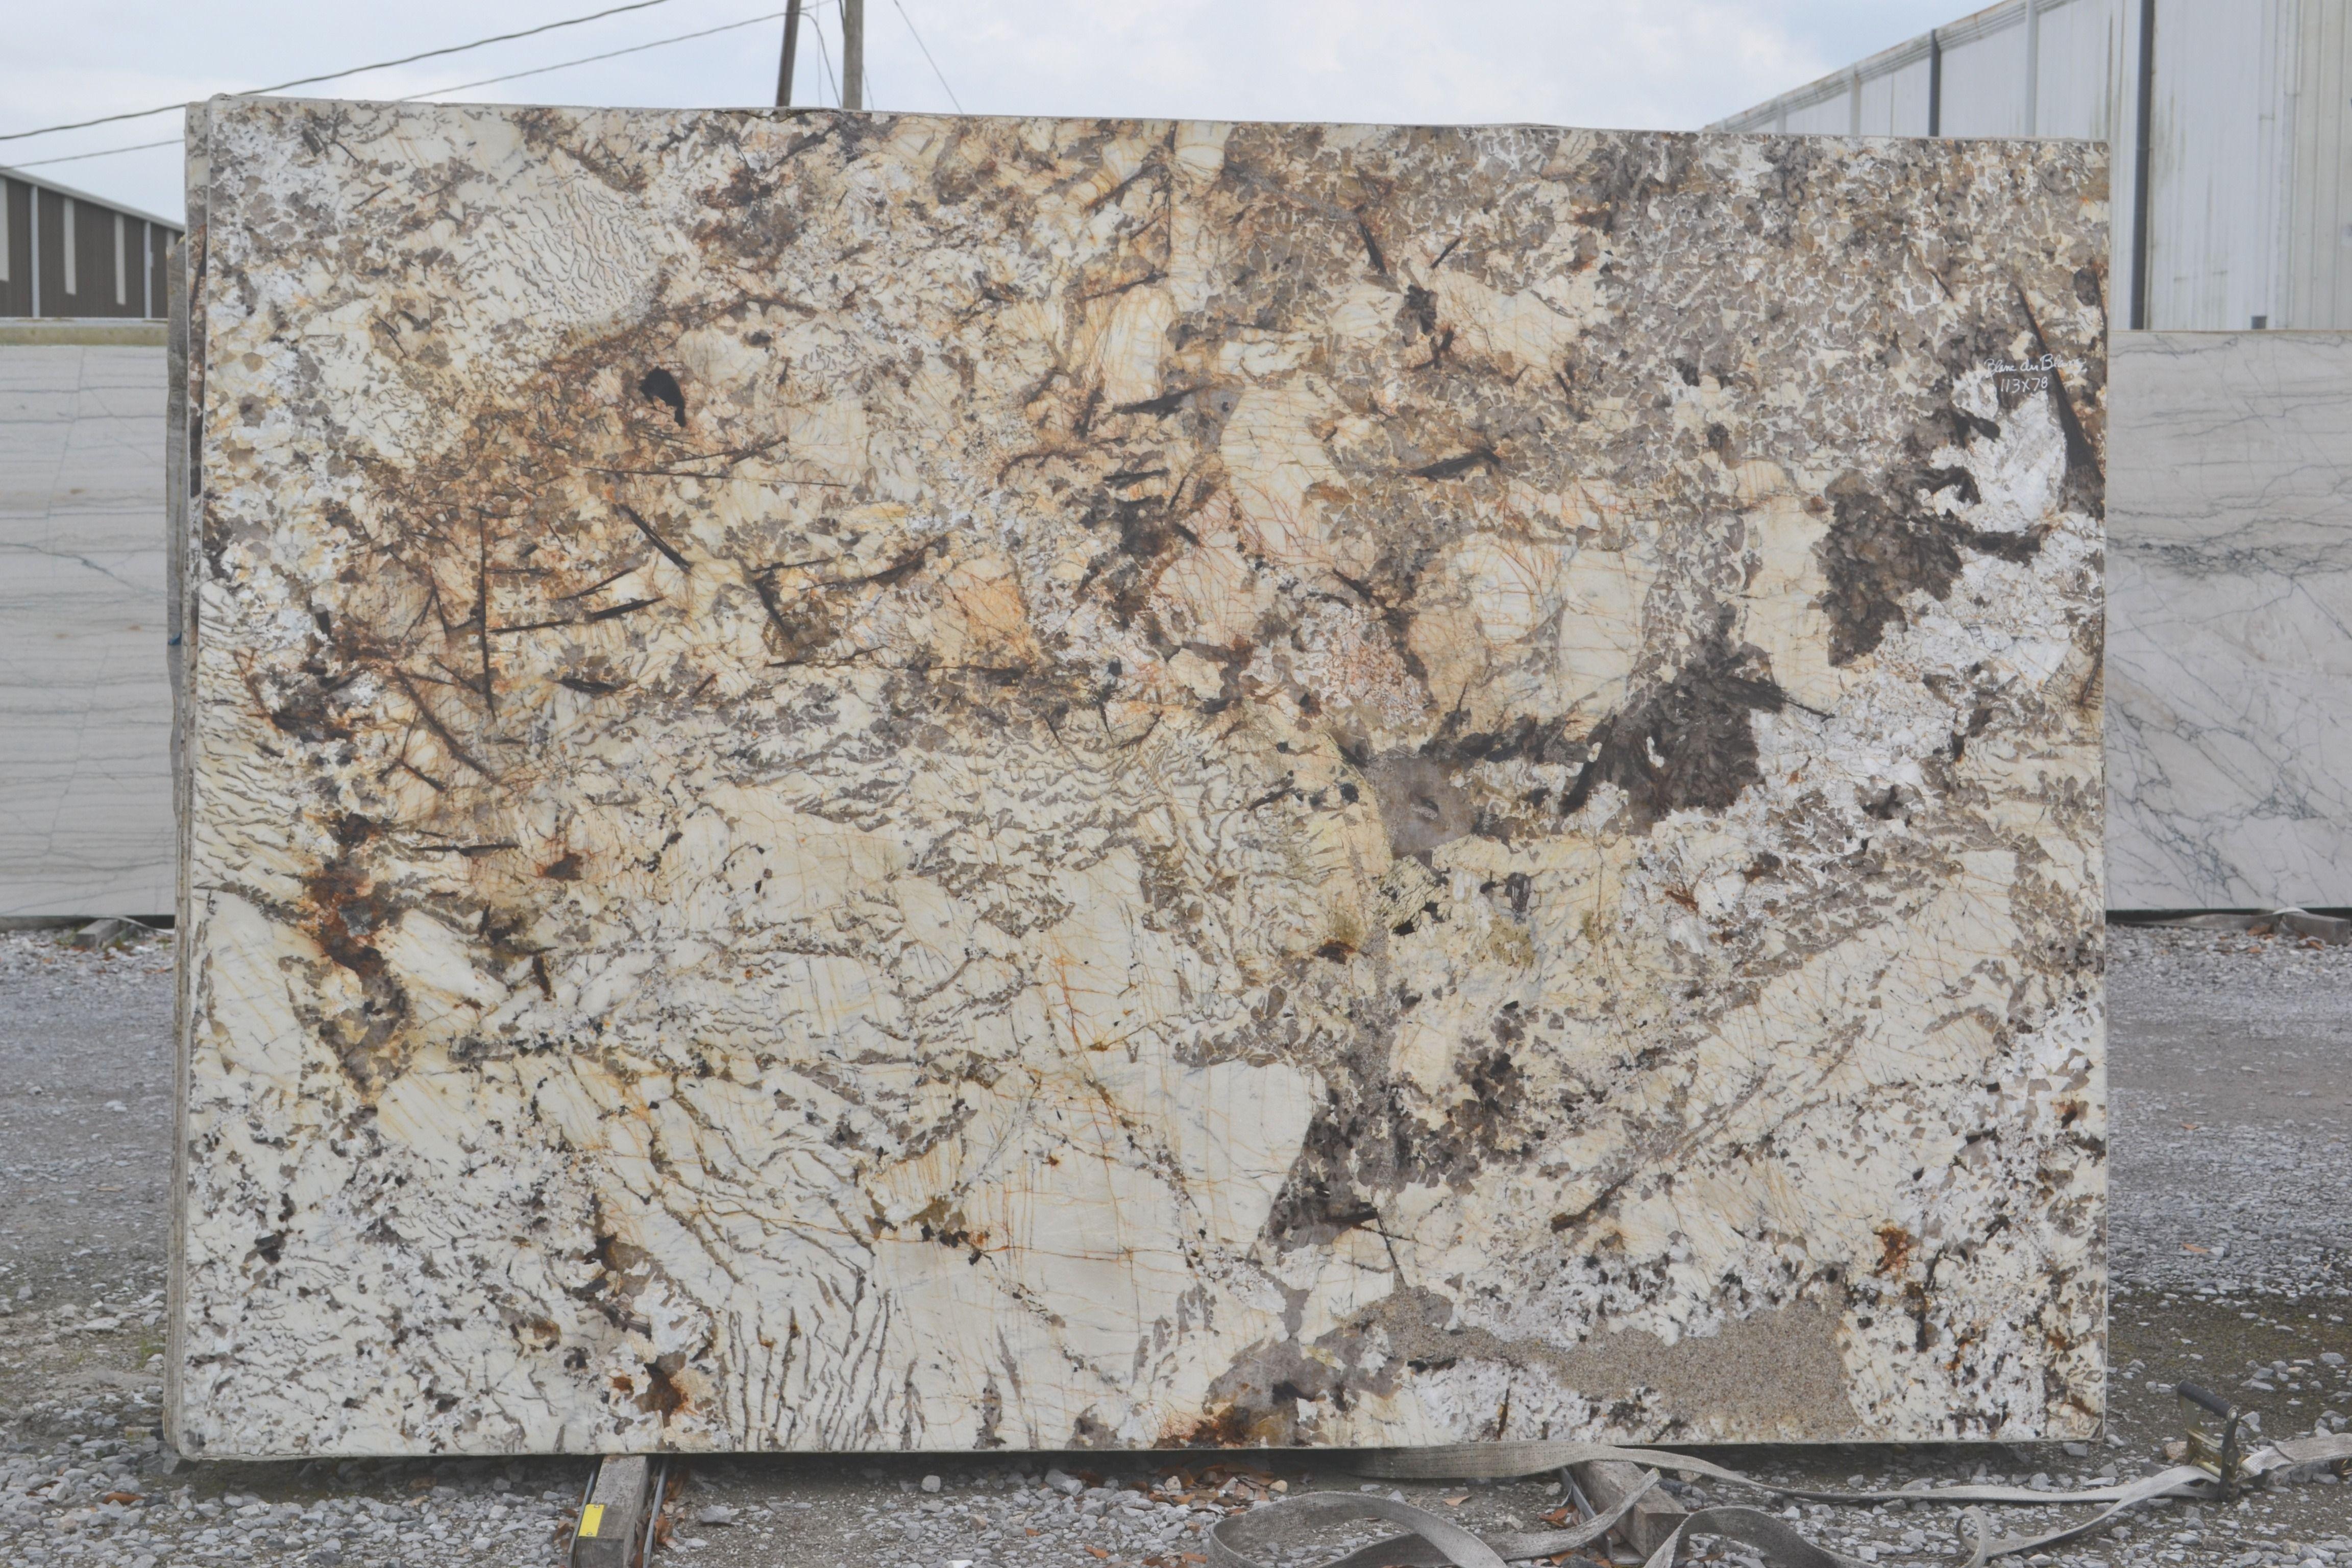 Blanc Du Blanc Granite Granite Slab Neworleans Stone Gallery Leather Granite Granite Slab